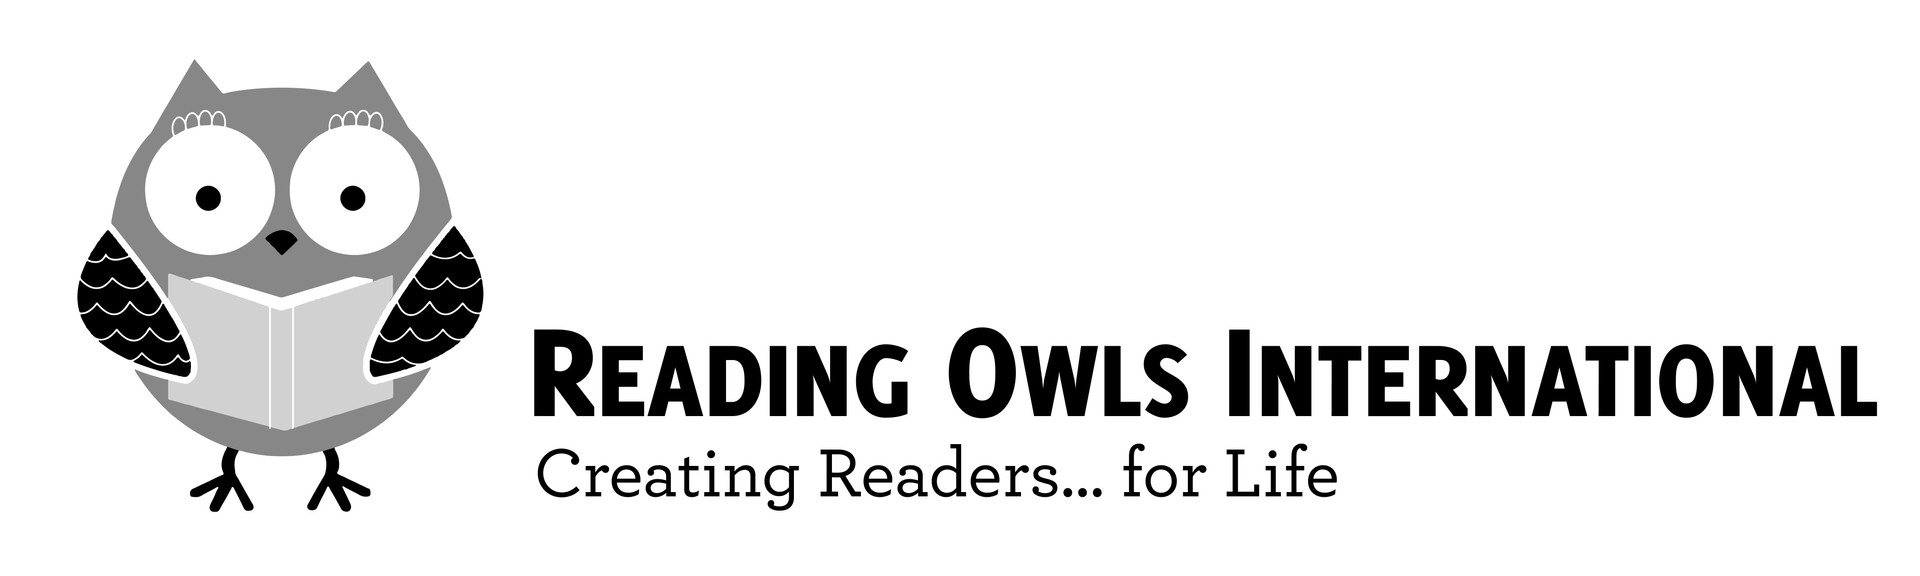 ROI-owl-FINAL (4).jpg